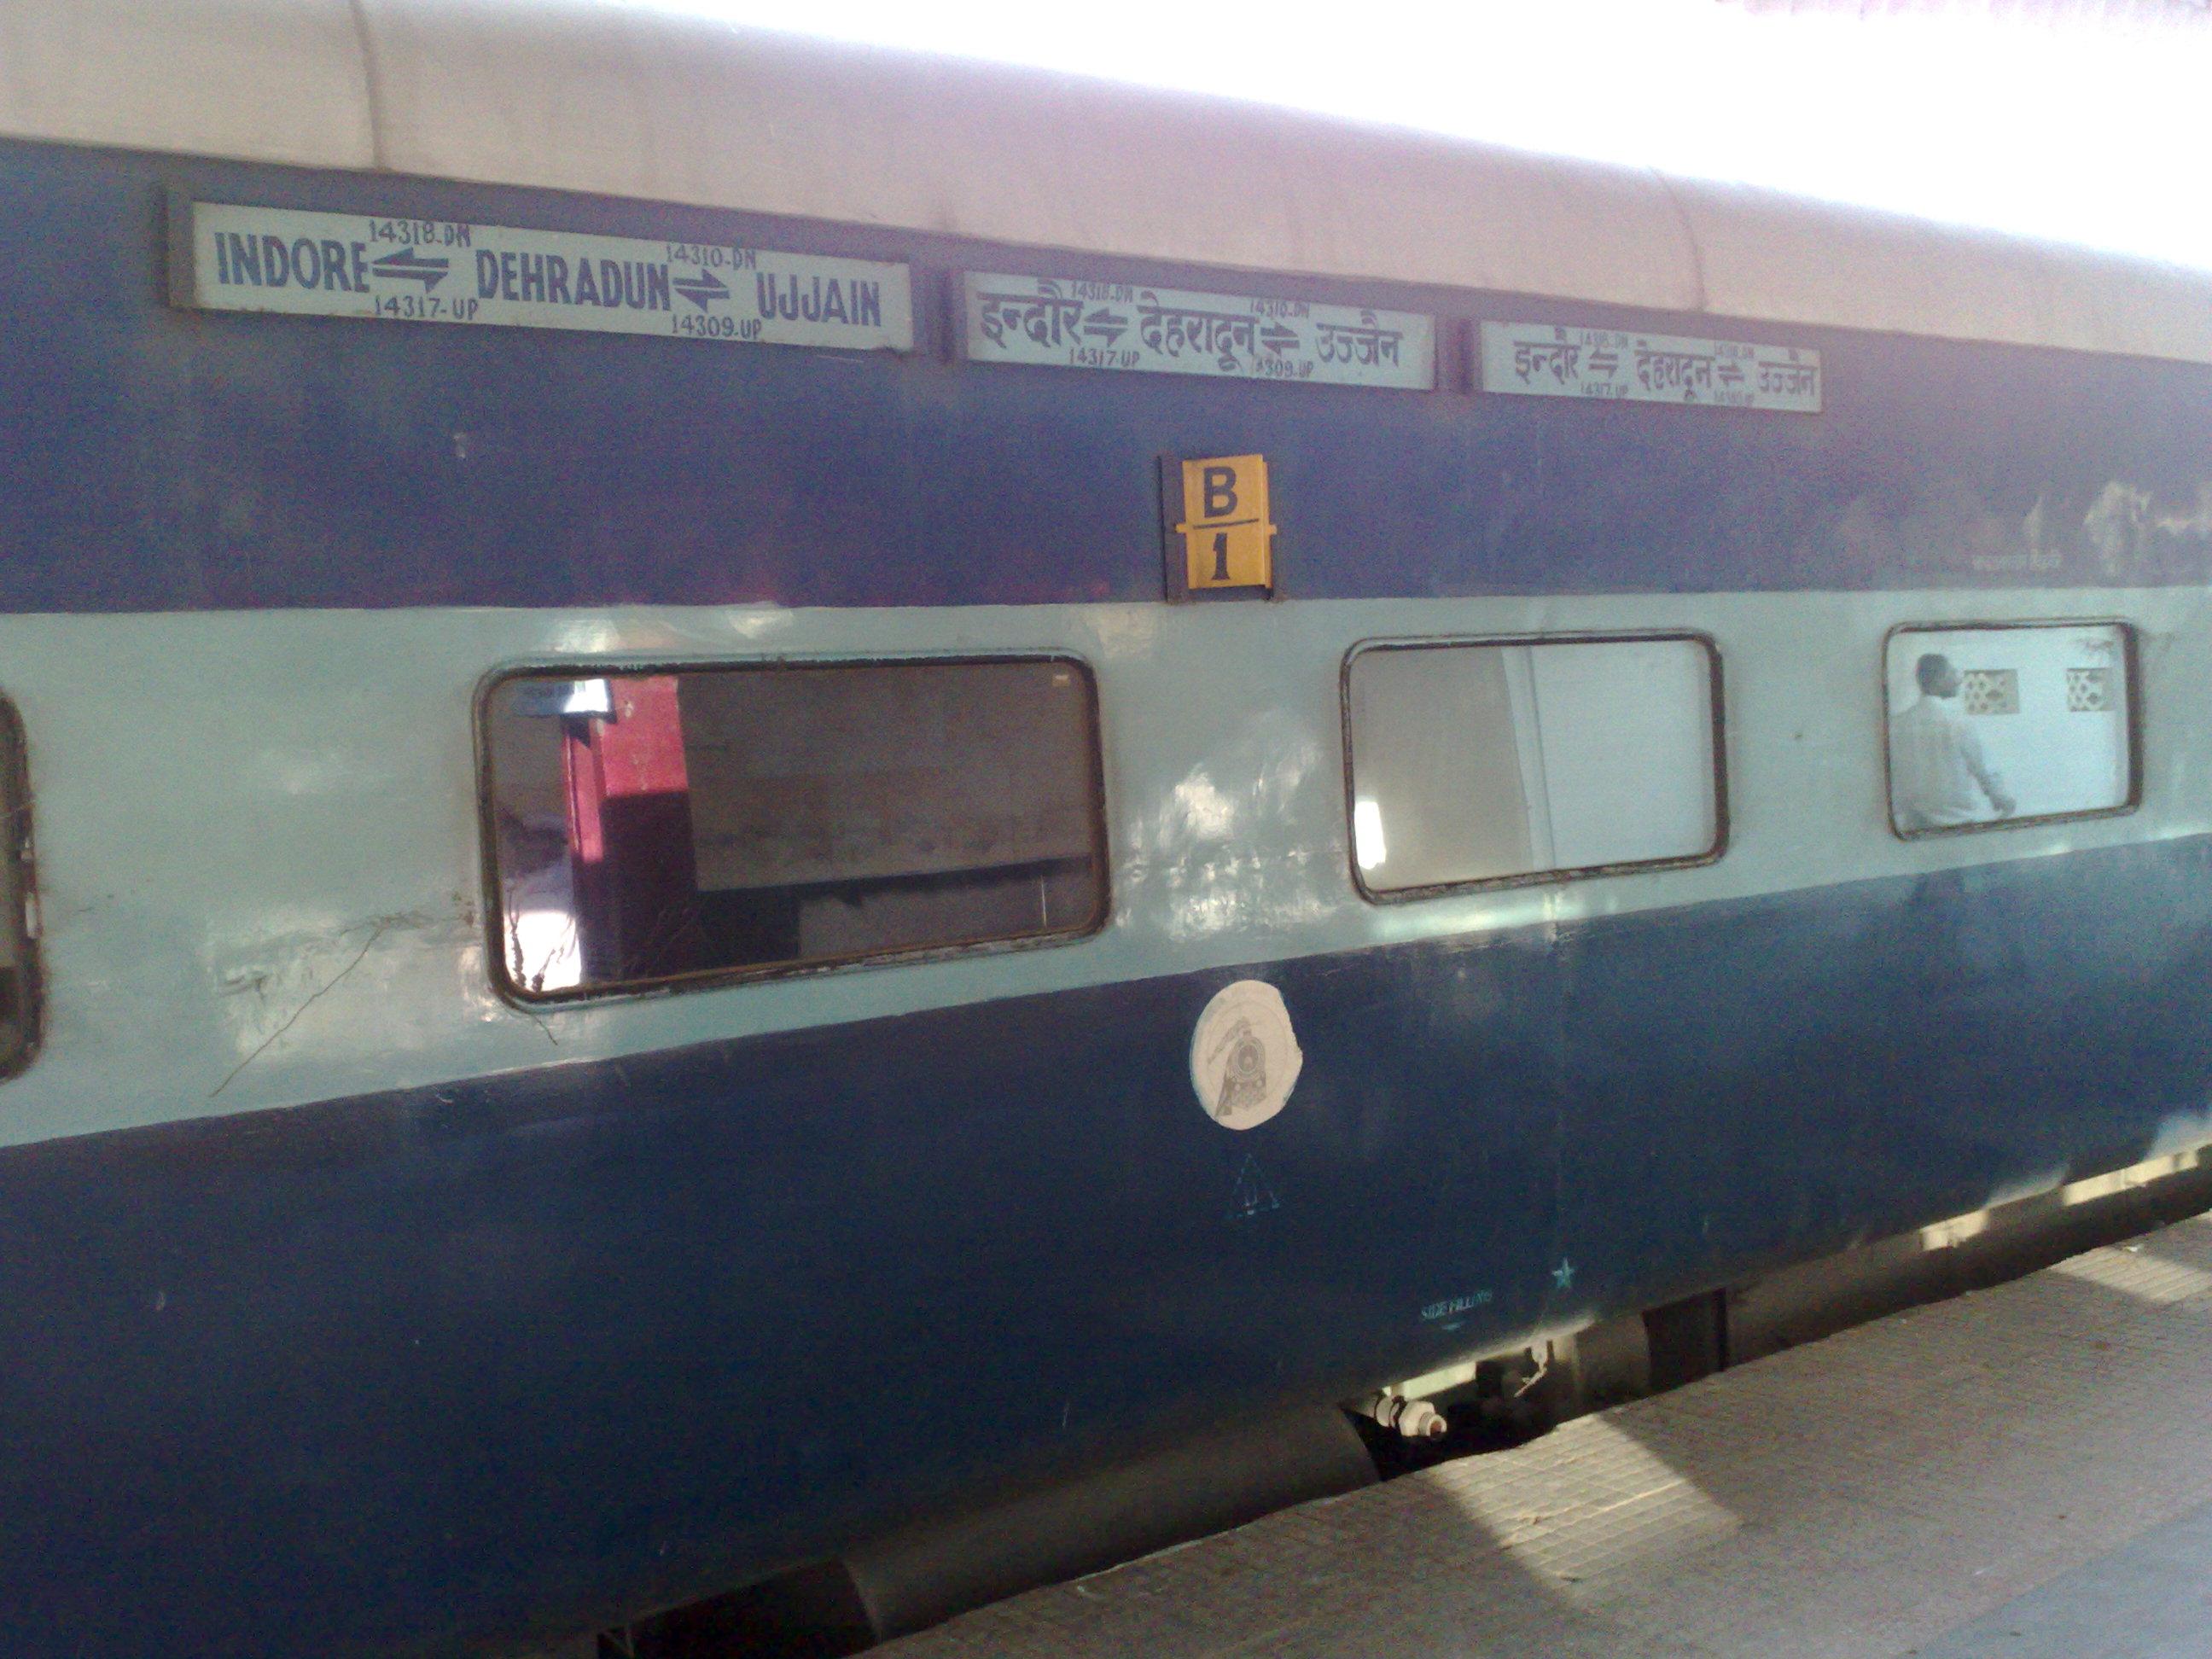 Dehradun - Indore Express